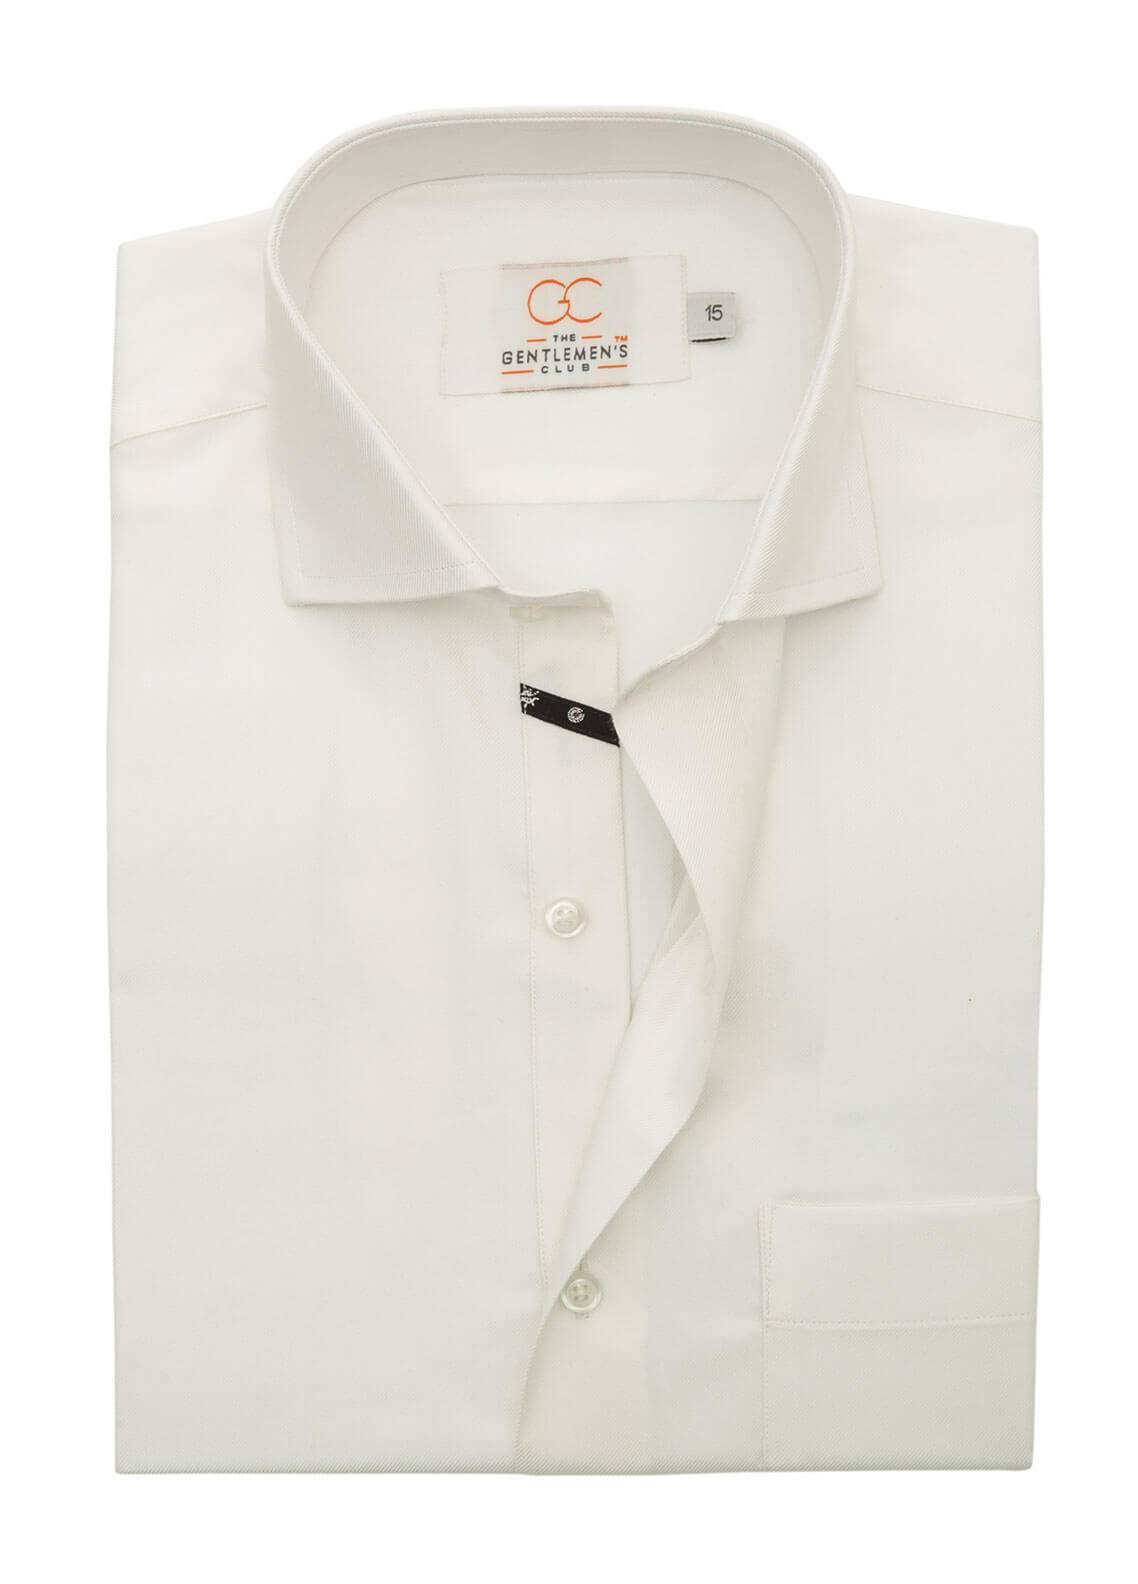 The Gentlemen's Club Cotton Formal Men Shirts - Off White White Label 4088 - 18.5